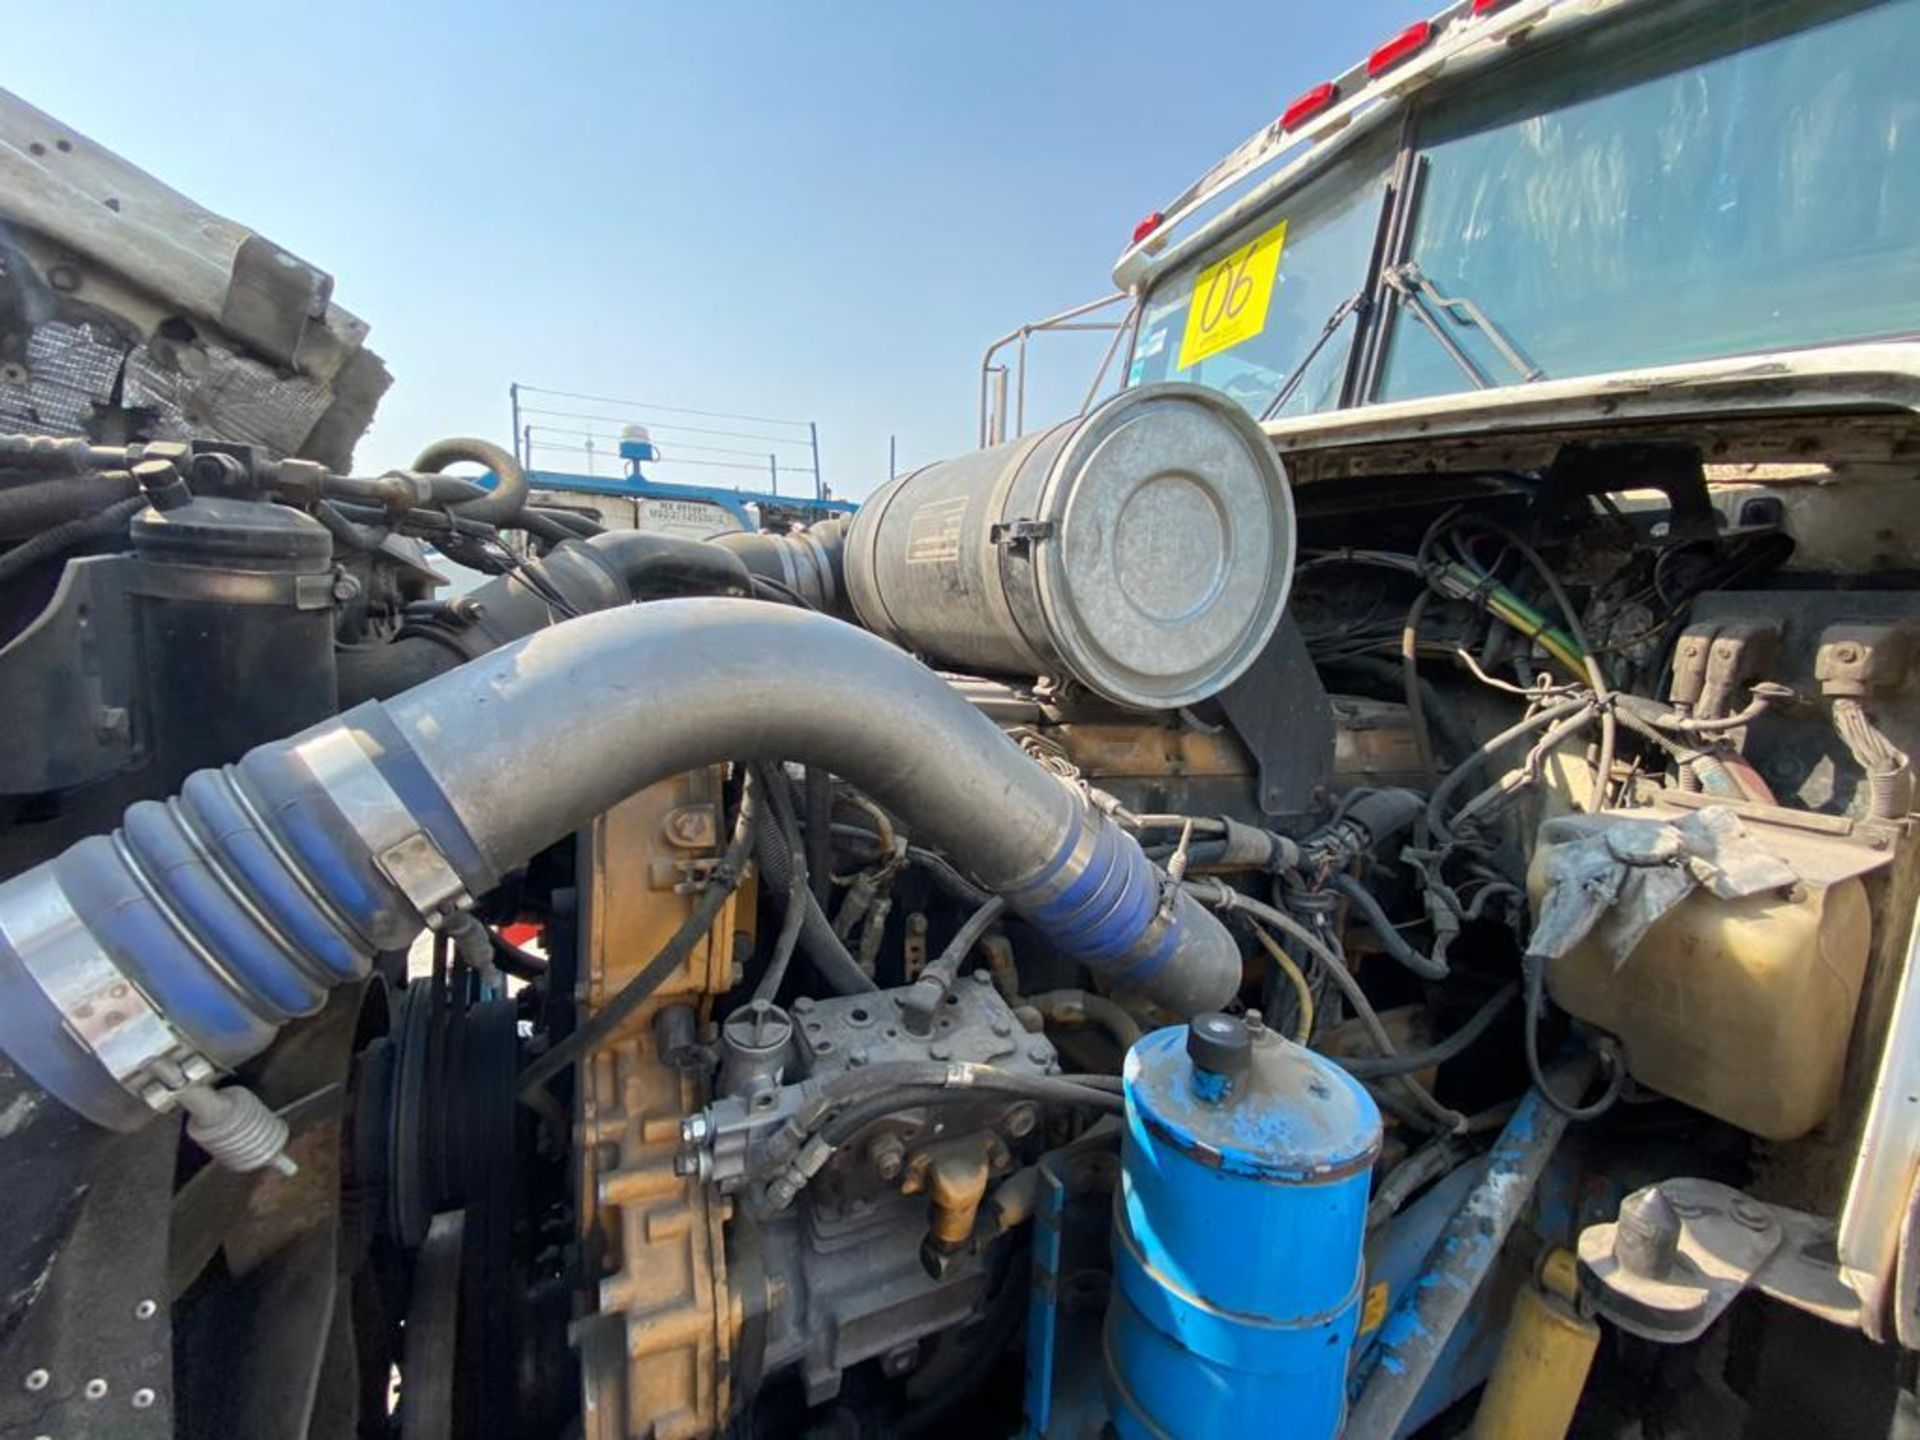 1998 Kenworth Sleeper truck tractor, standard transmission of 18 speeds - Image 72 of 75